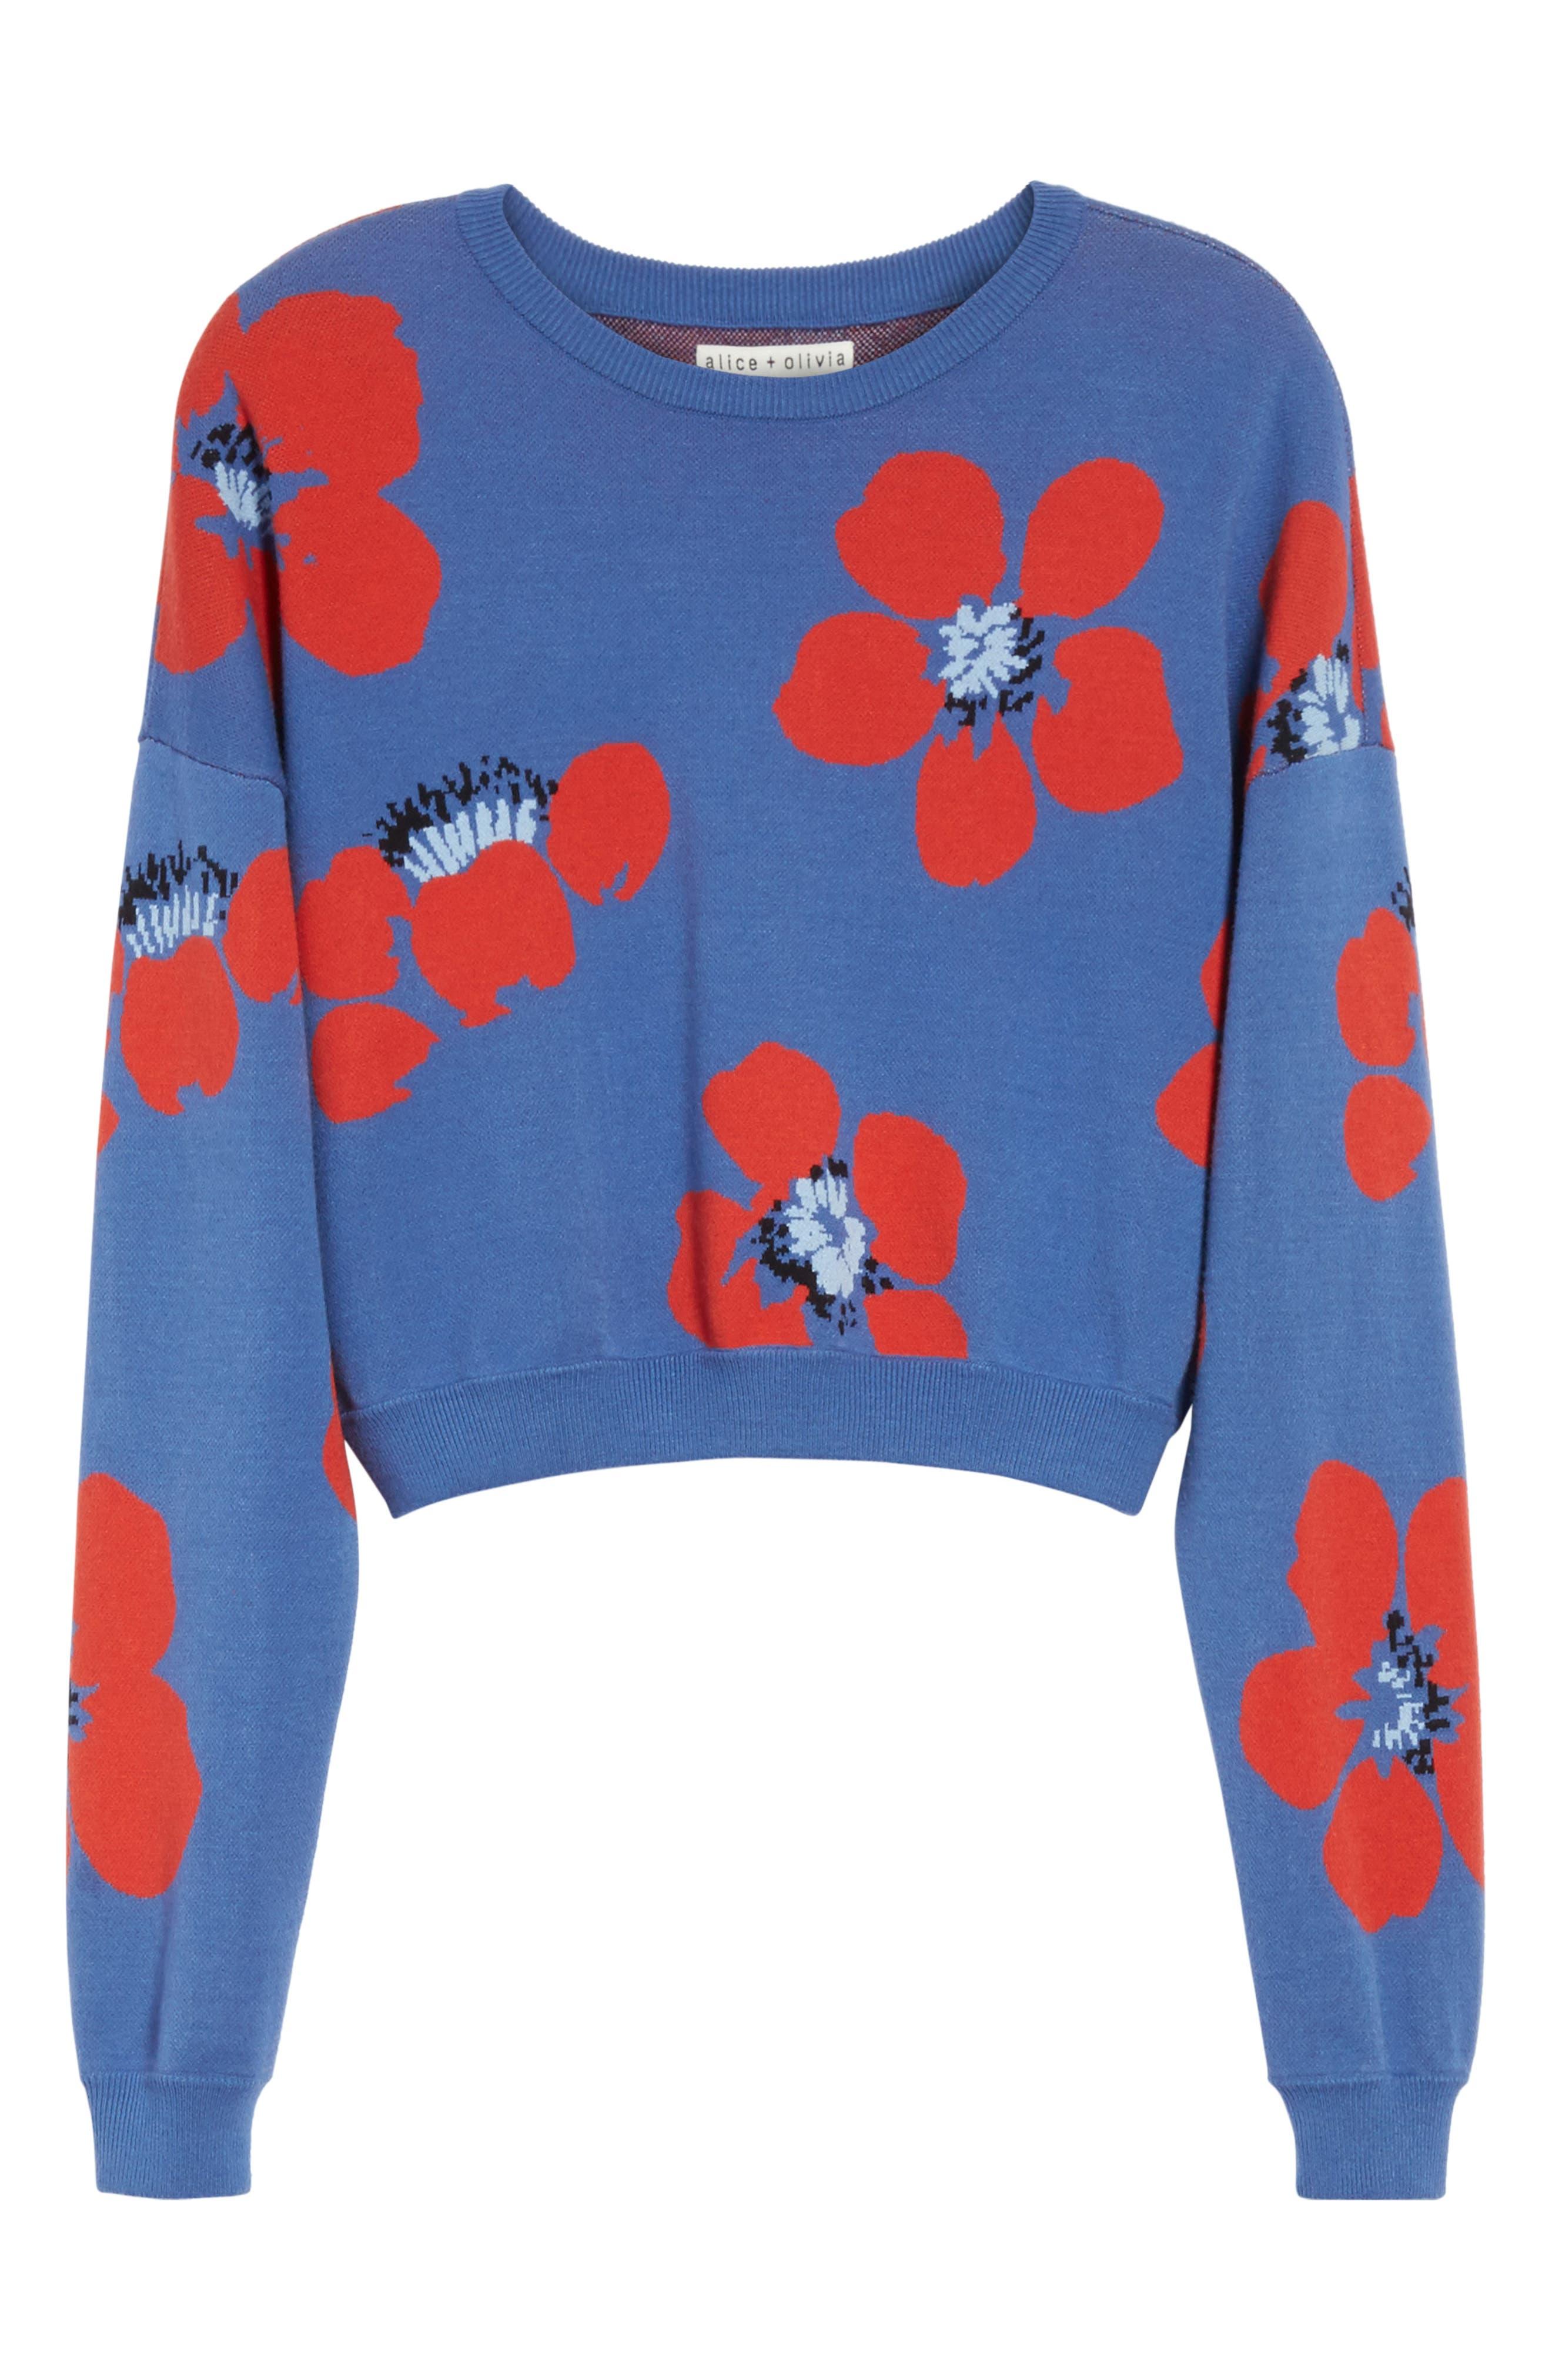 Leena Floral Crop Sweatshirt,                             Alternate thumbnail 6, color,                             Blue Quartz Multi